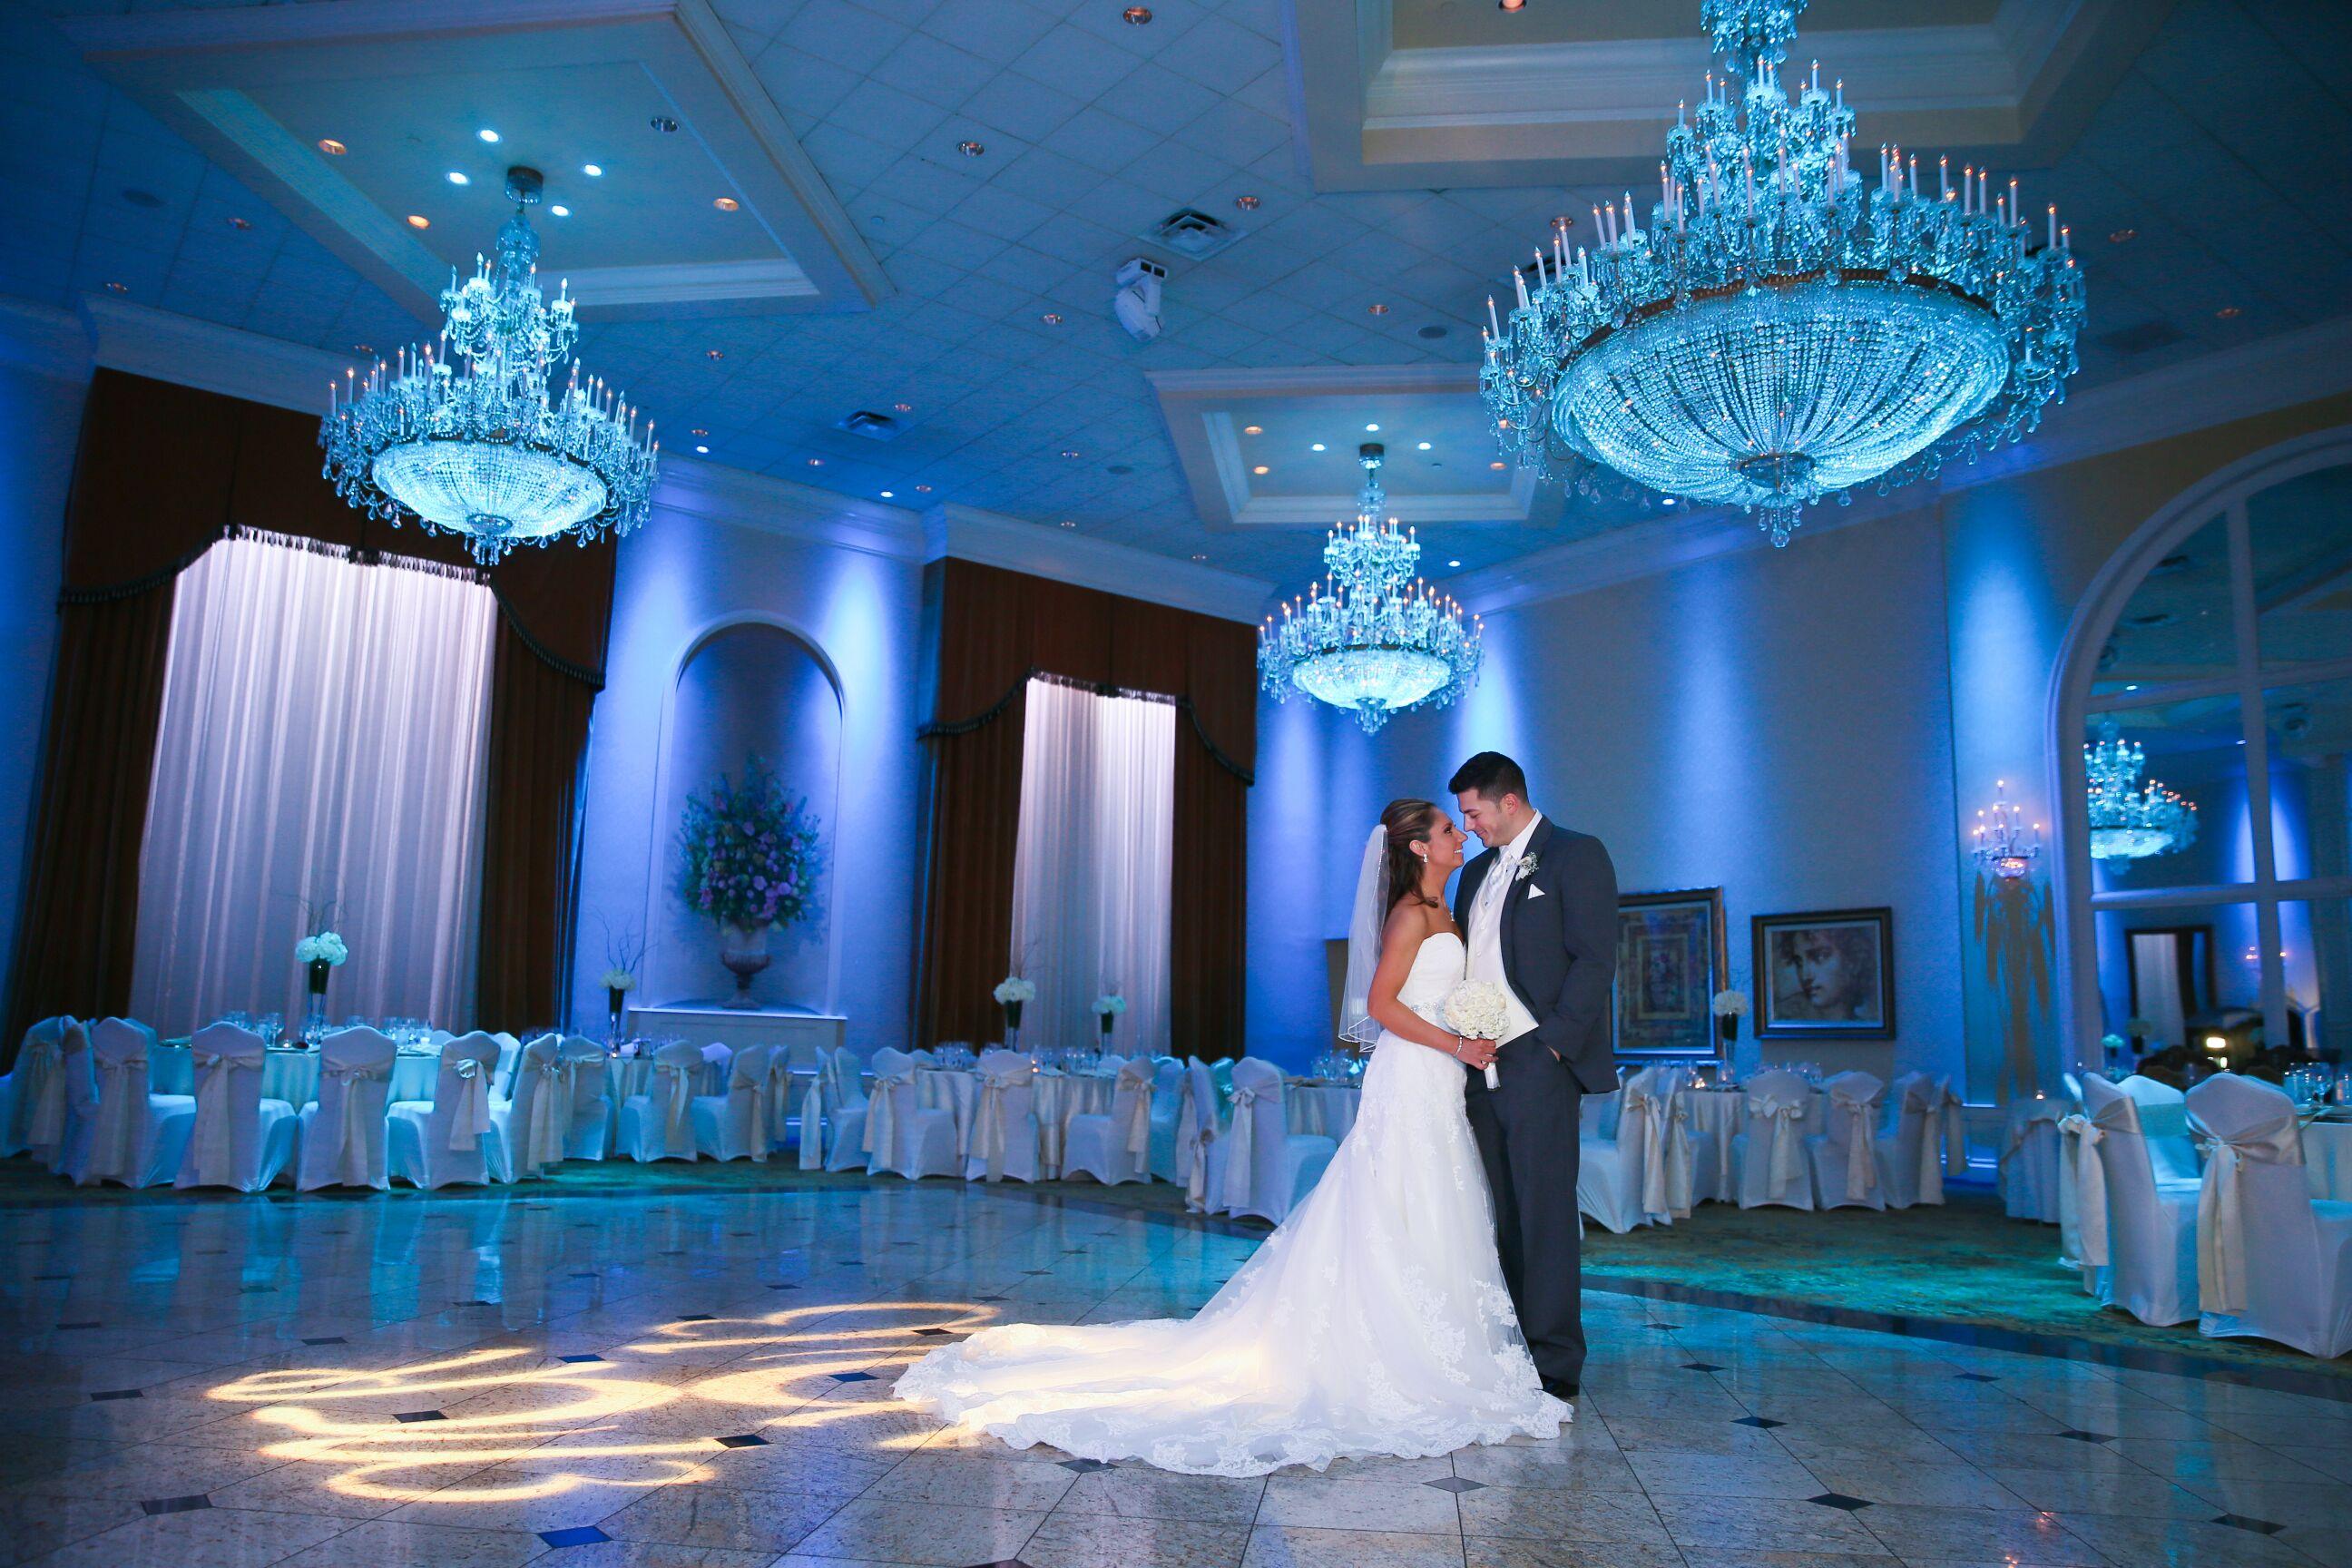 wedding reception venues in newark nj the knot